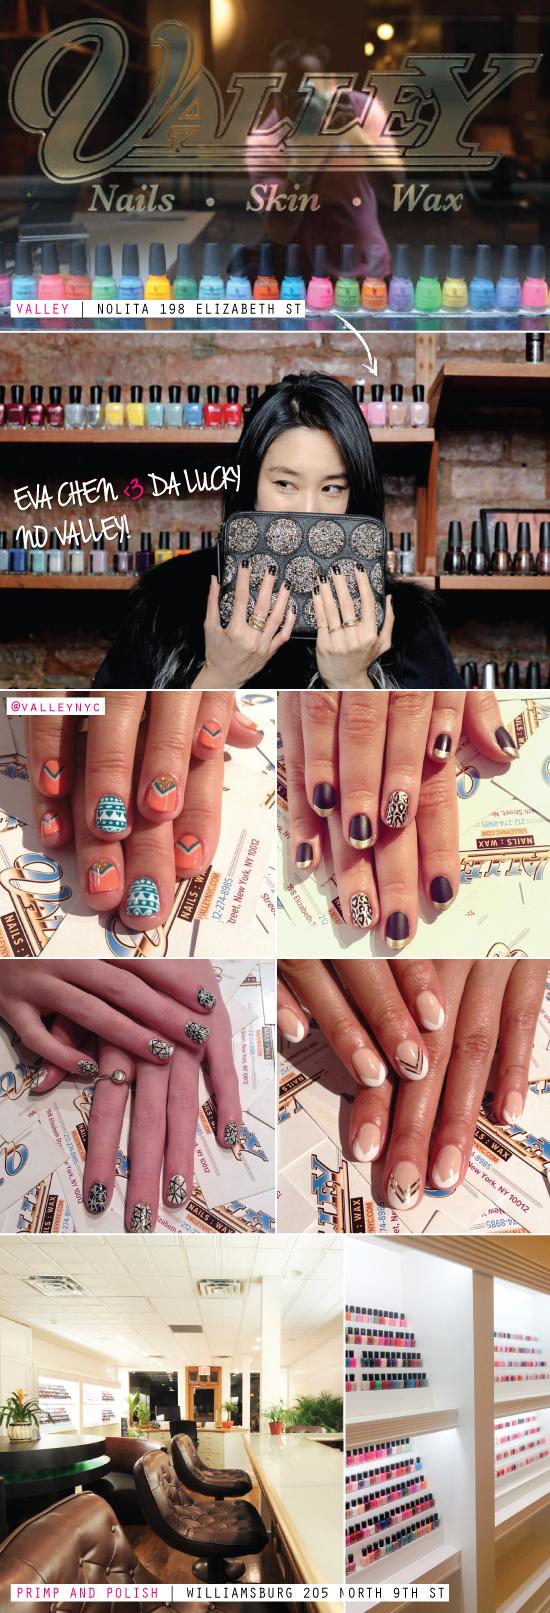 NY-UNHAS-manicure-salao-onde-fazer-indicacao-nail-art-decoradas-dica-viagem-beleza-esmalte-salon-dica-tips-travel-blog-studio-l-midtown-valley-eva-chen-primp-and-polish-williamsburg-brooklyn-nolita